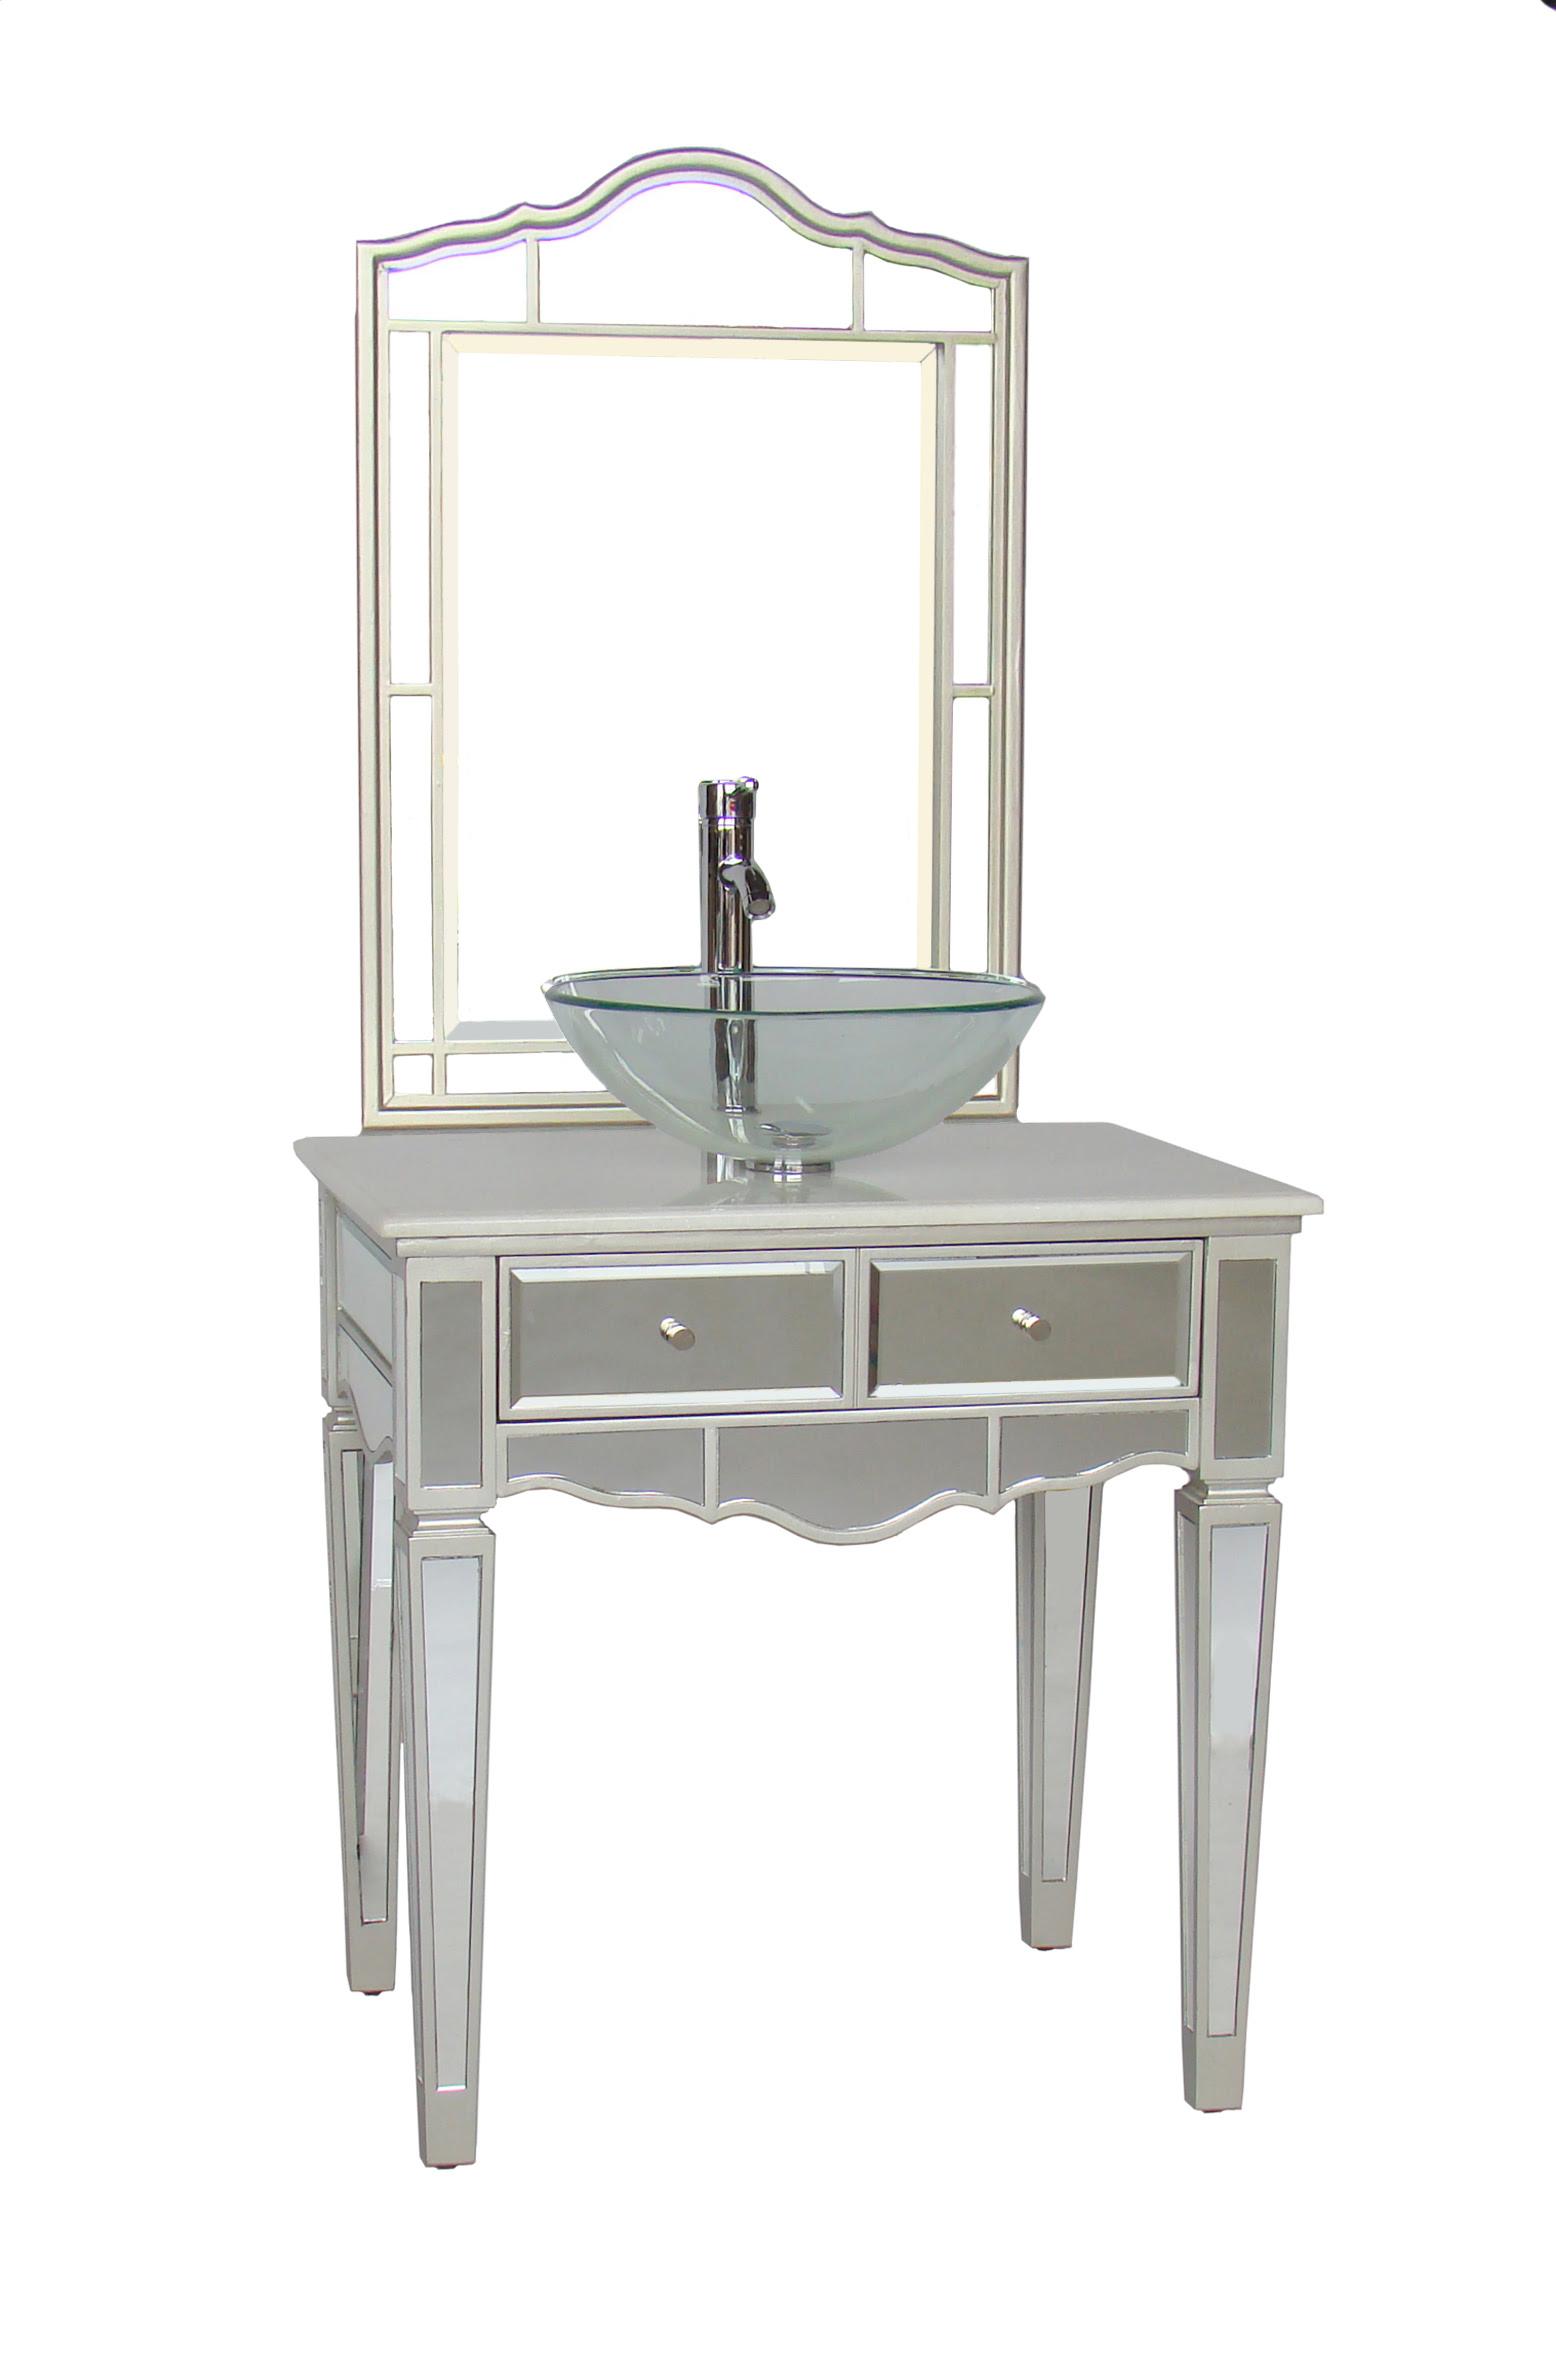 Bathroom Vanity Ideas Better Homes And Gardens Best